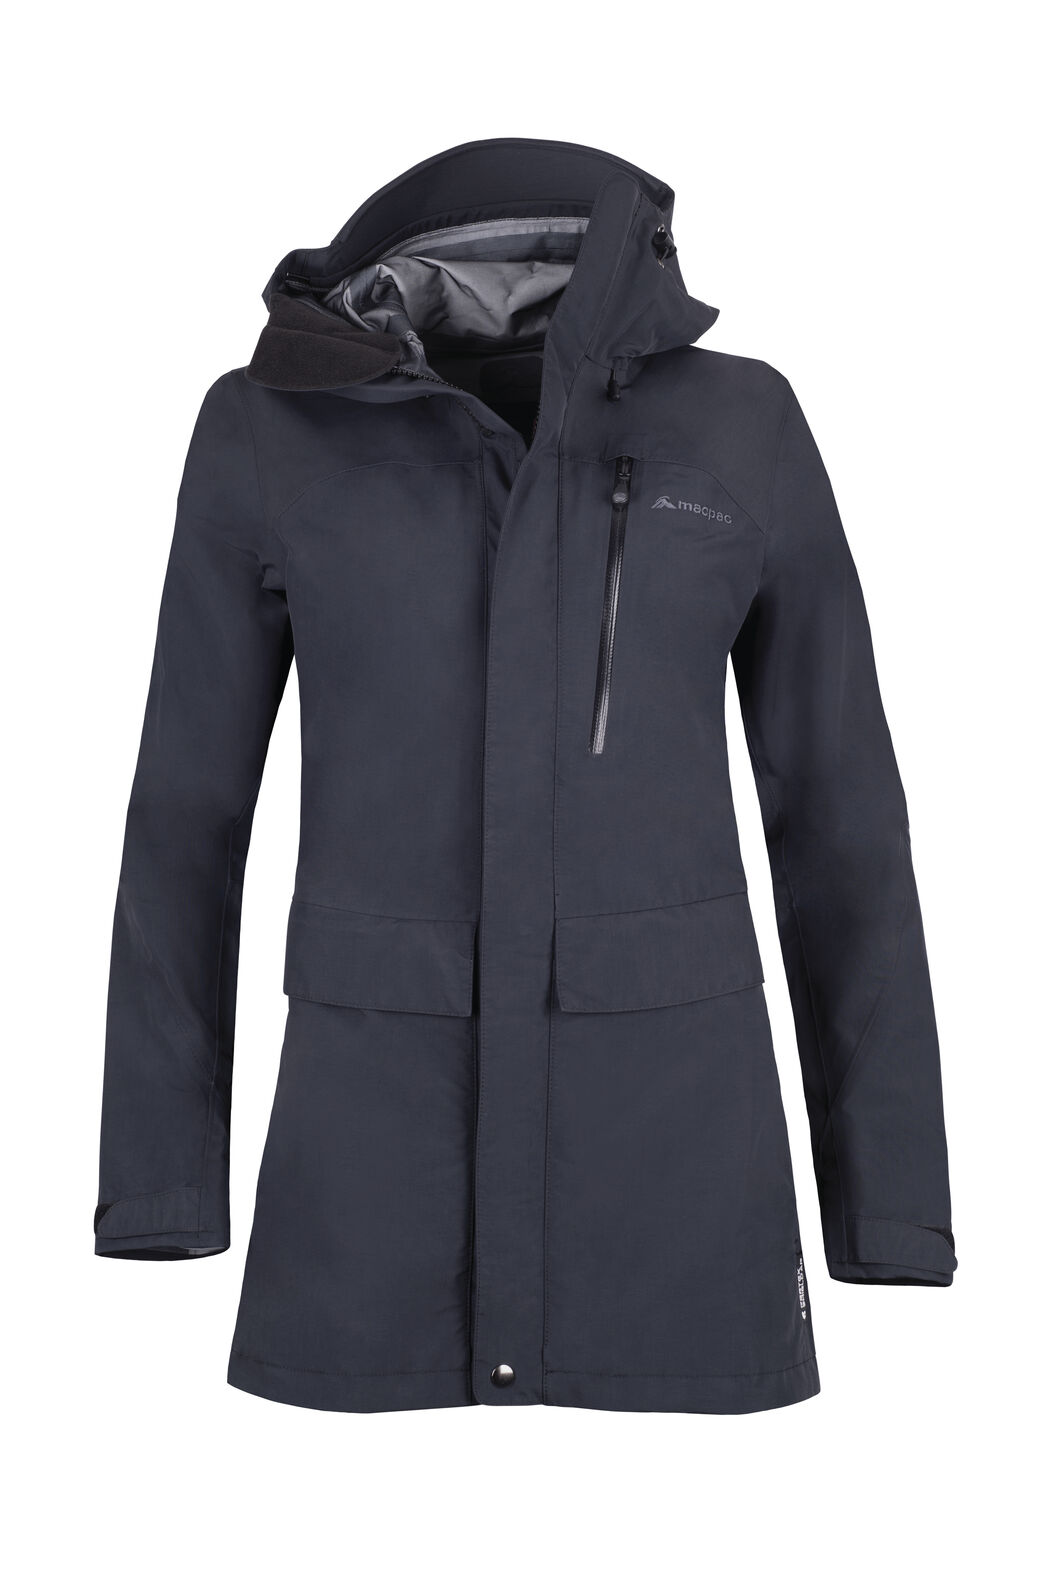 Macpac Resolution Pertex® Rain Jacket — Women's, Black, hi-res